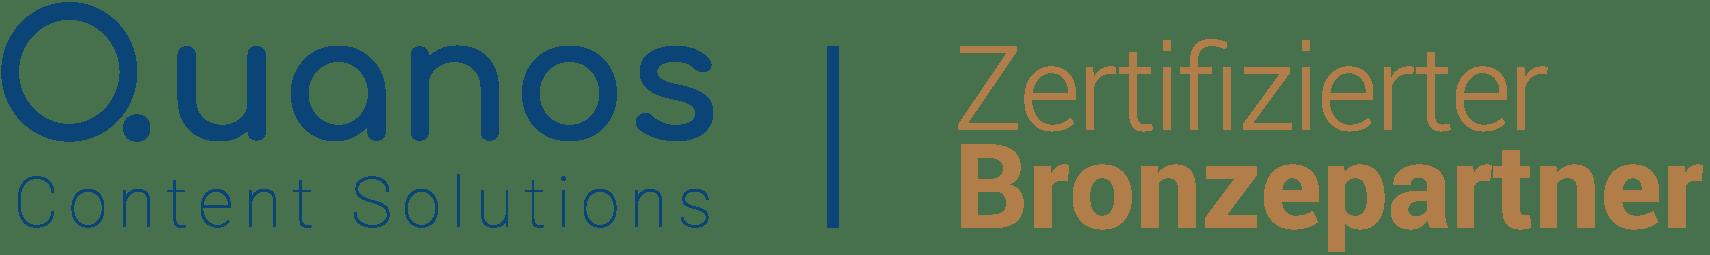 text&form - Quanos zertifizierter Bronzepartner